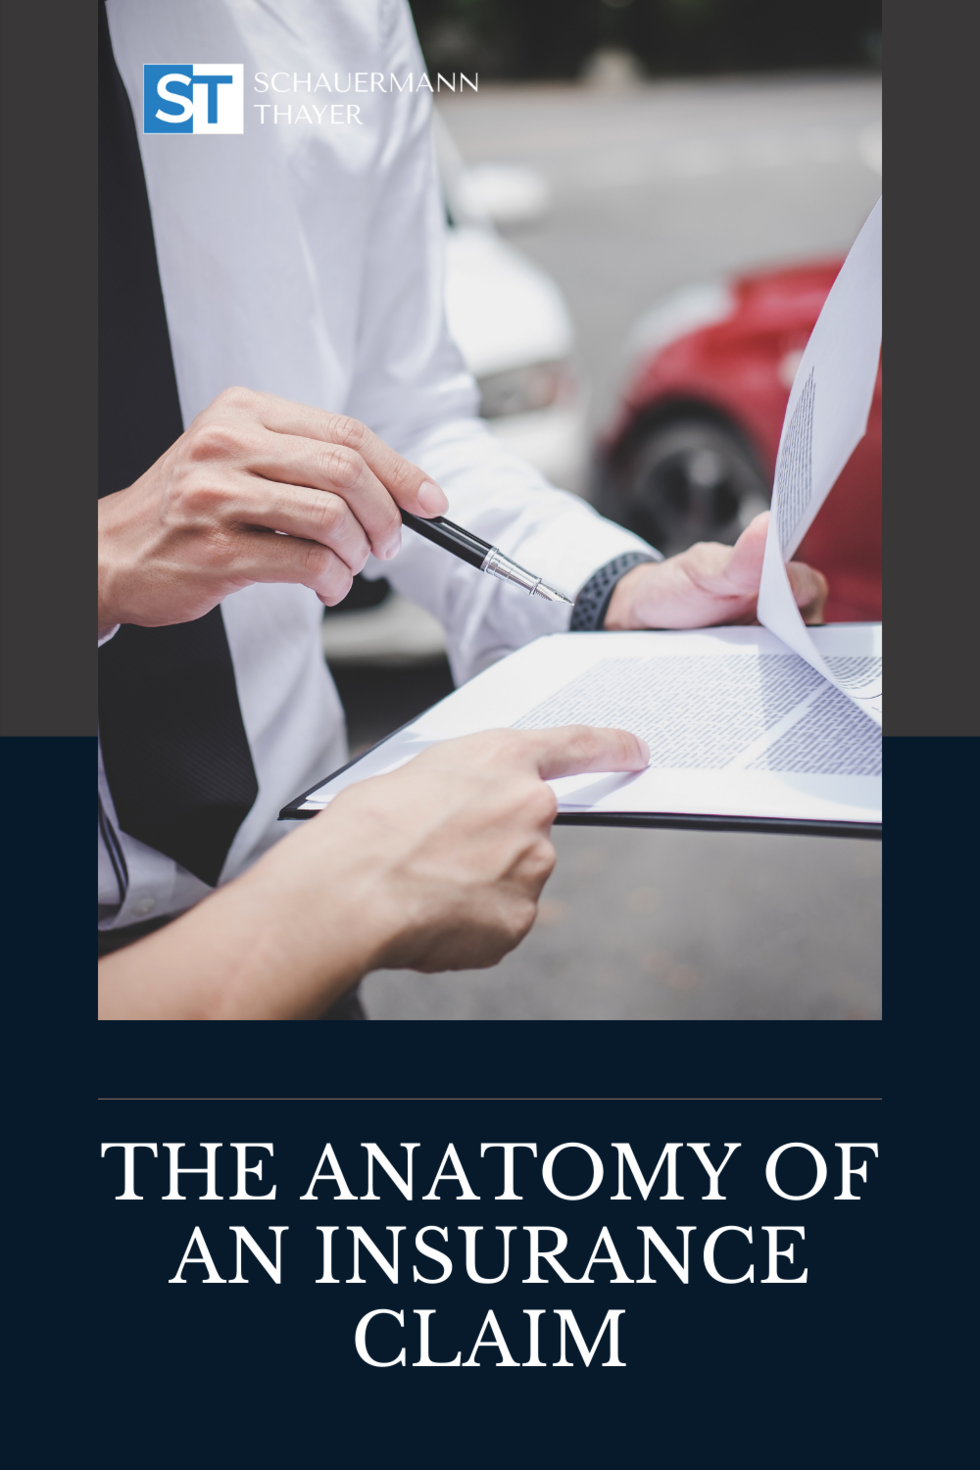 anatomy_of_an_insurance_claim